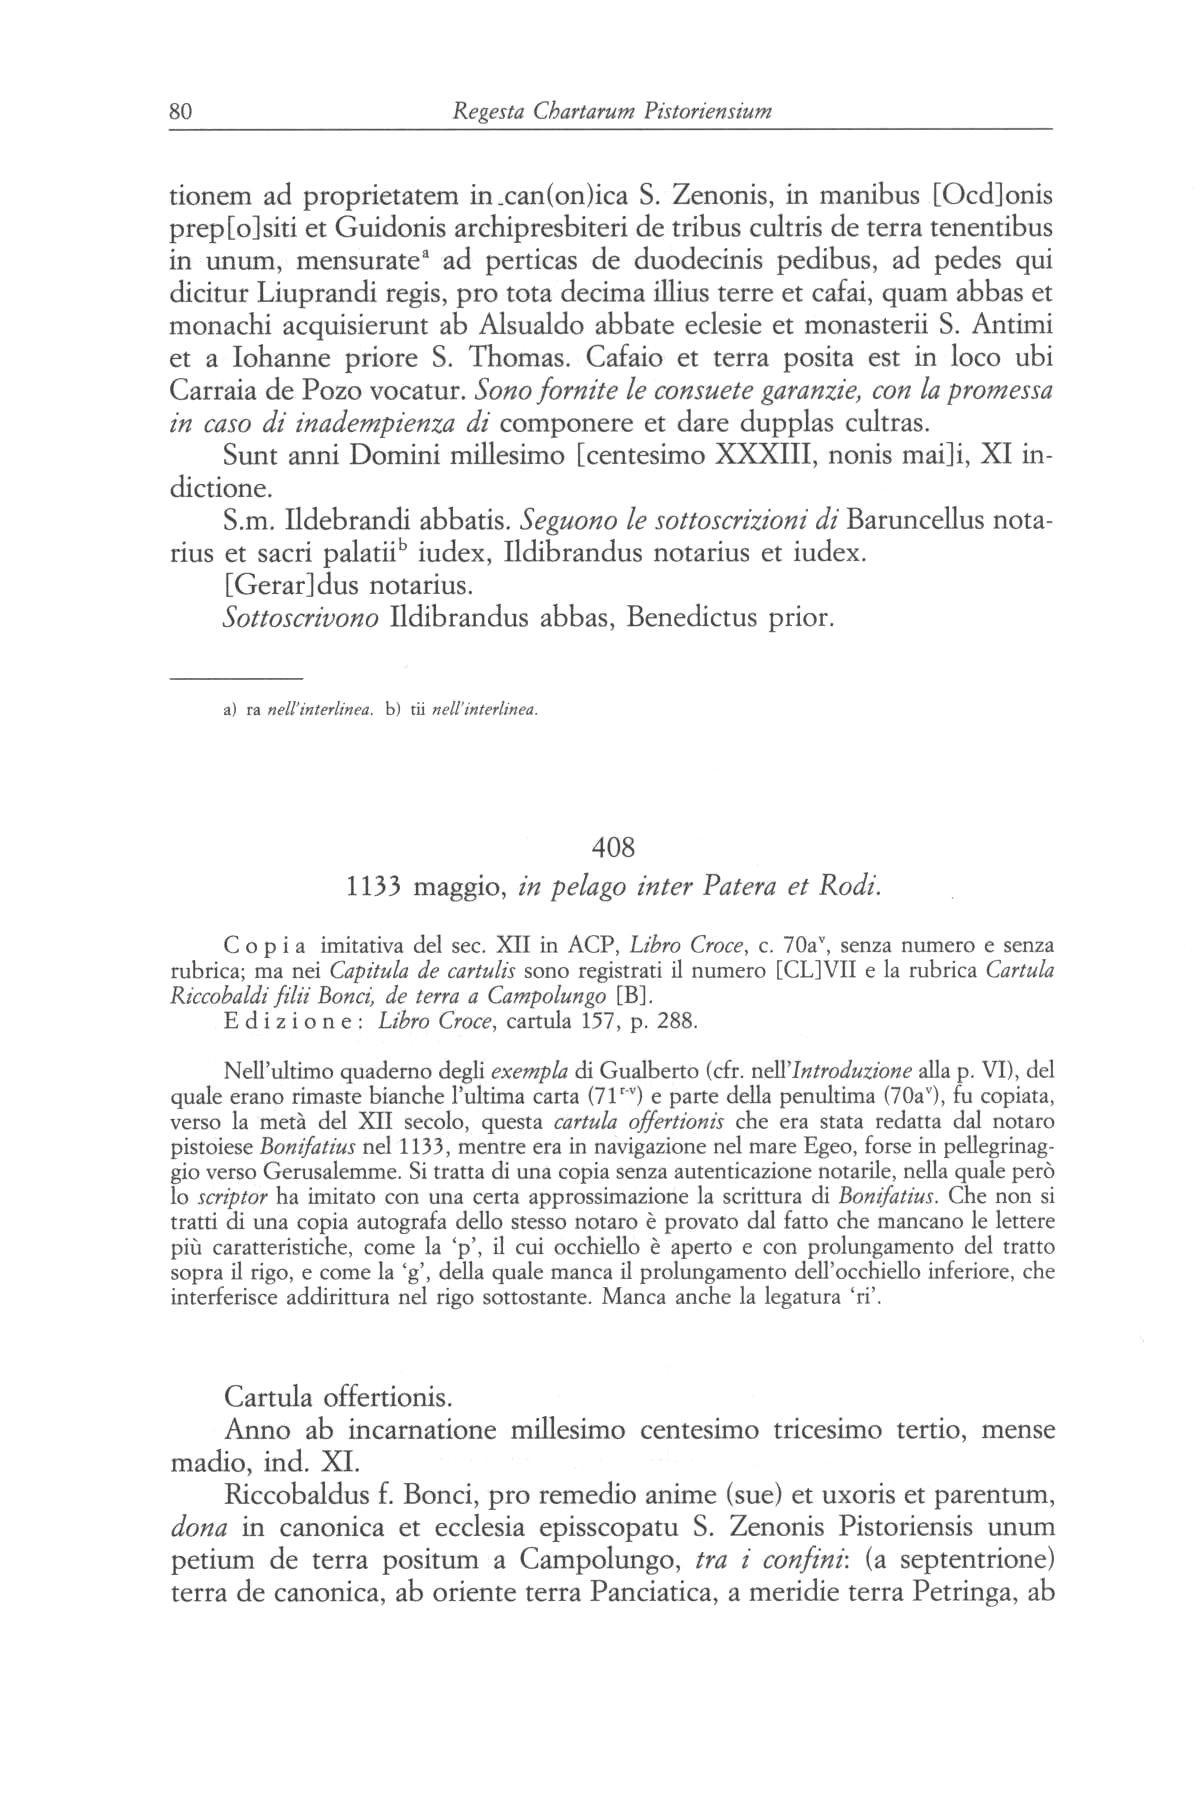 Canonica S. Zenone XII 0080.jpg